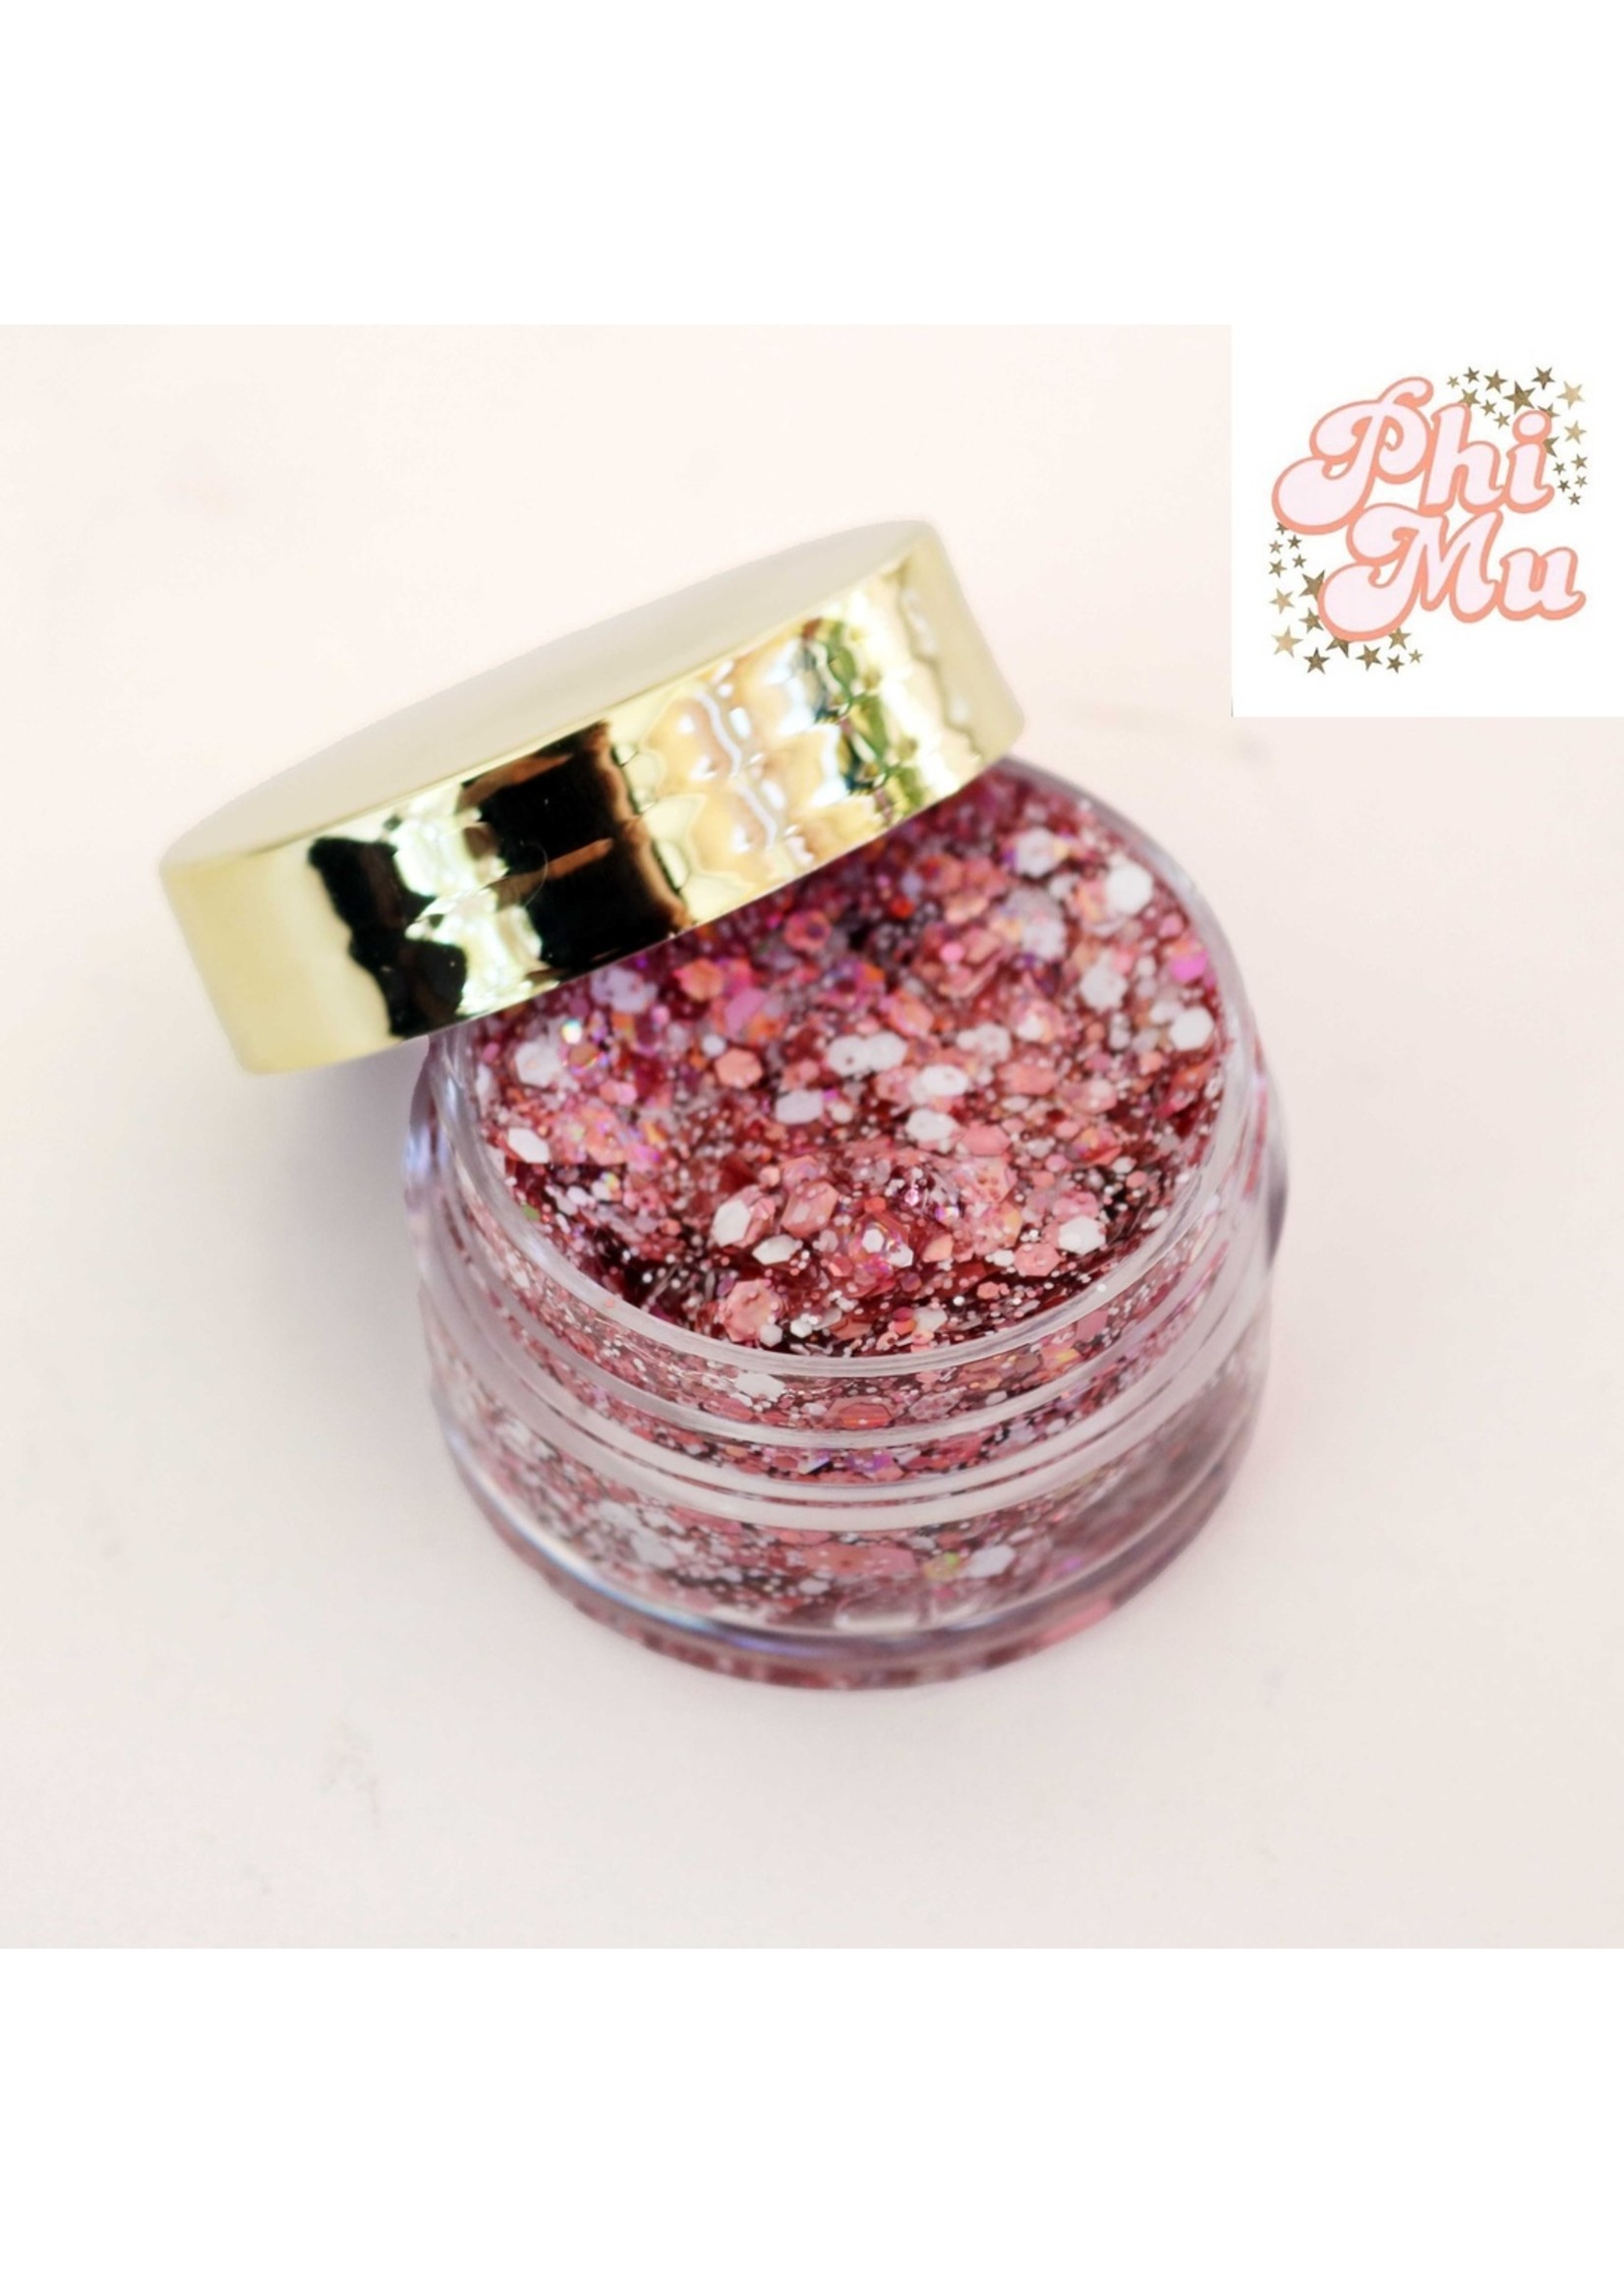 Kizmet Cosmetics Face Glitter - Phi Mu